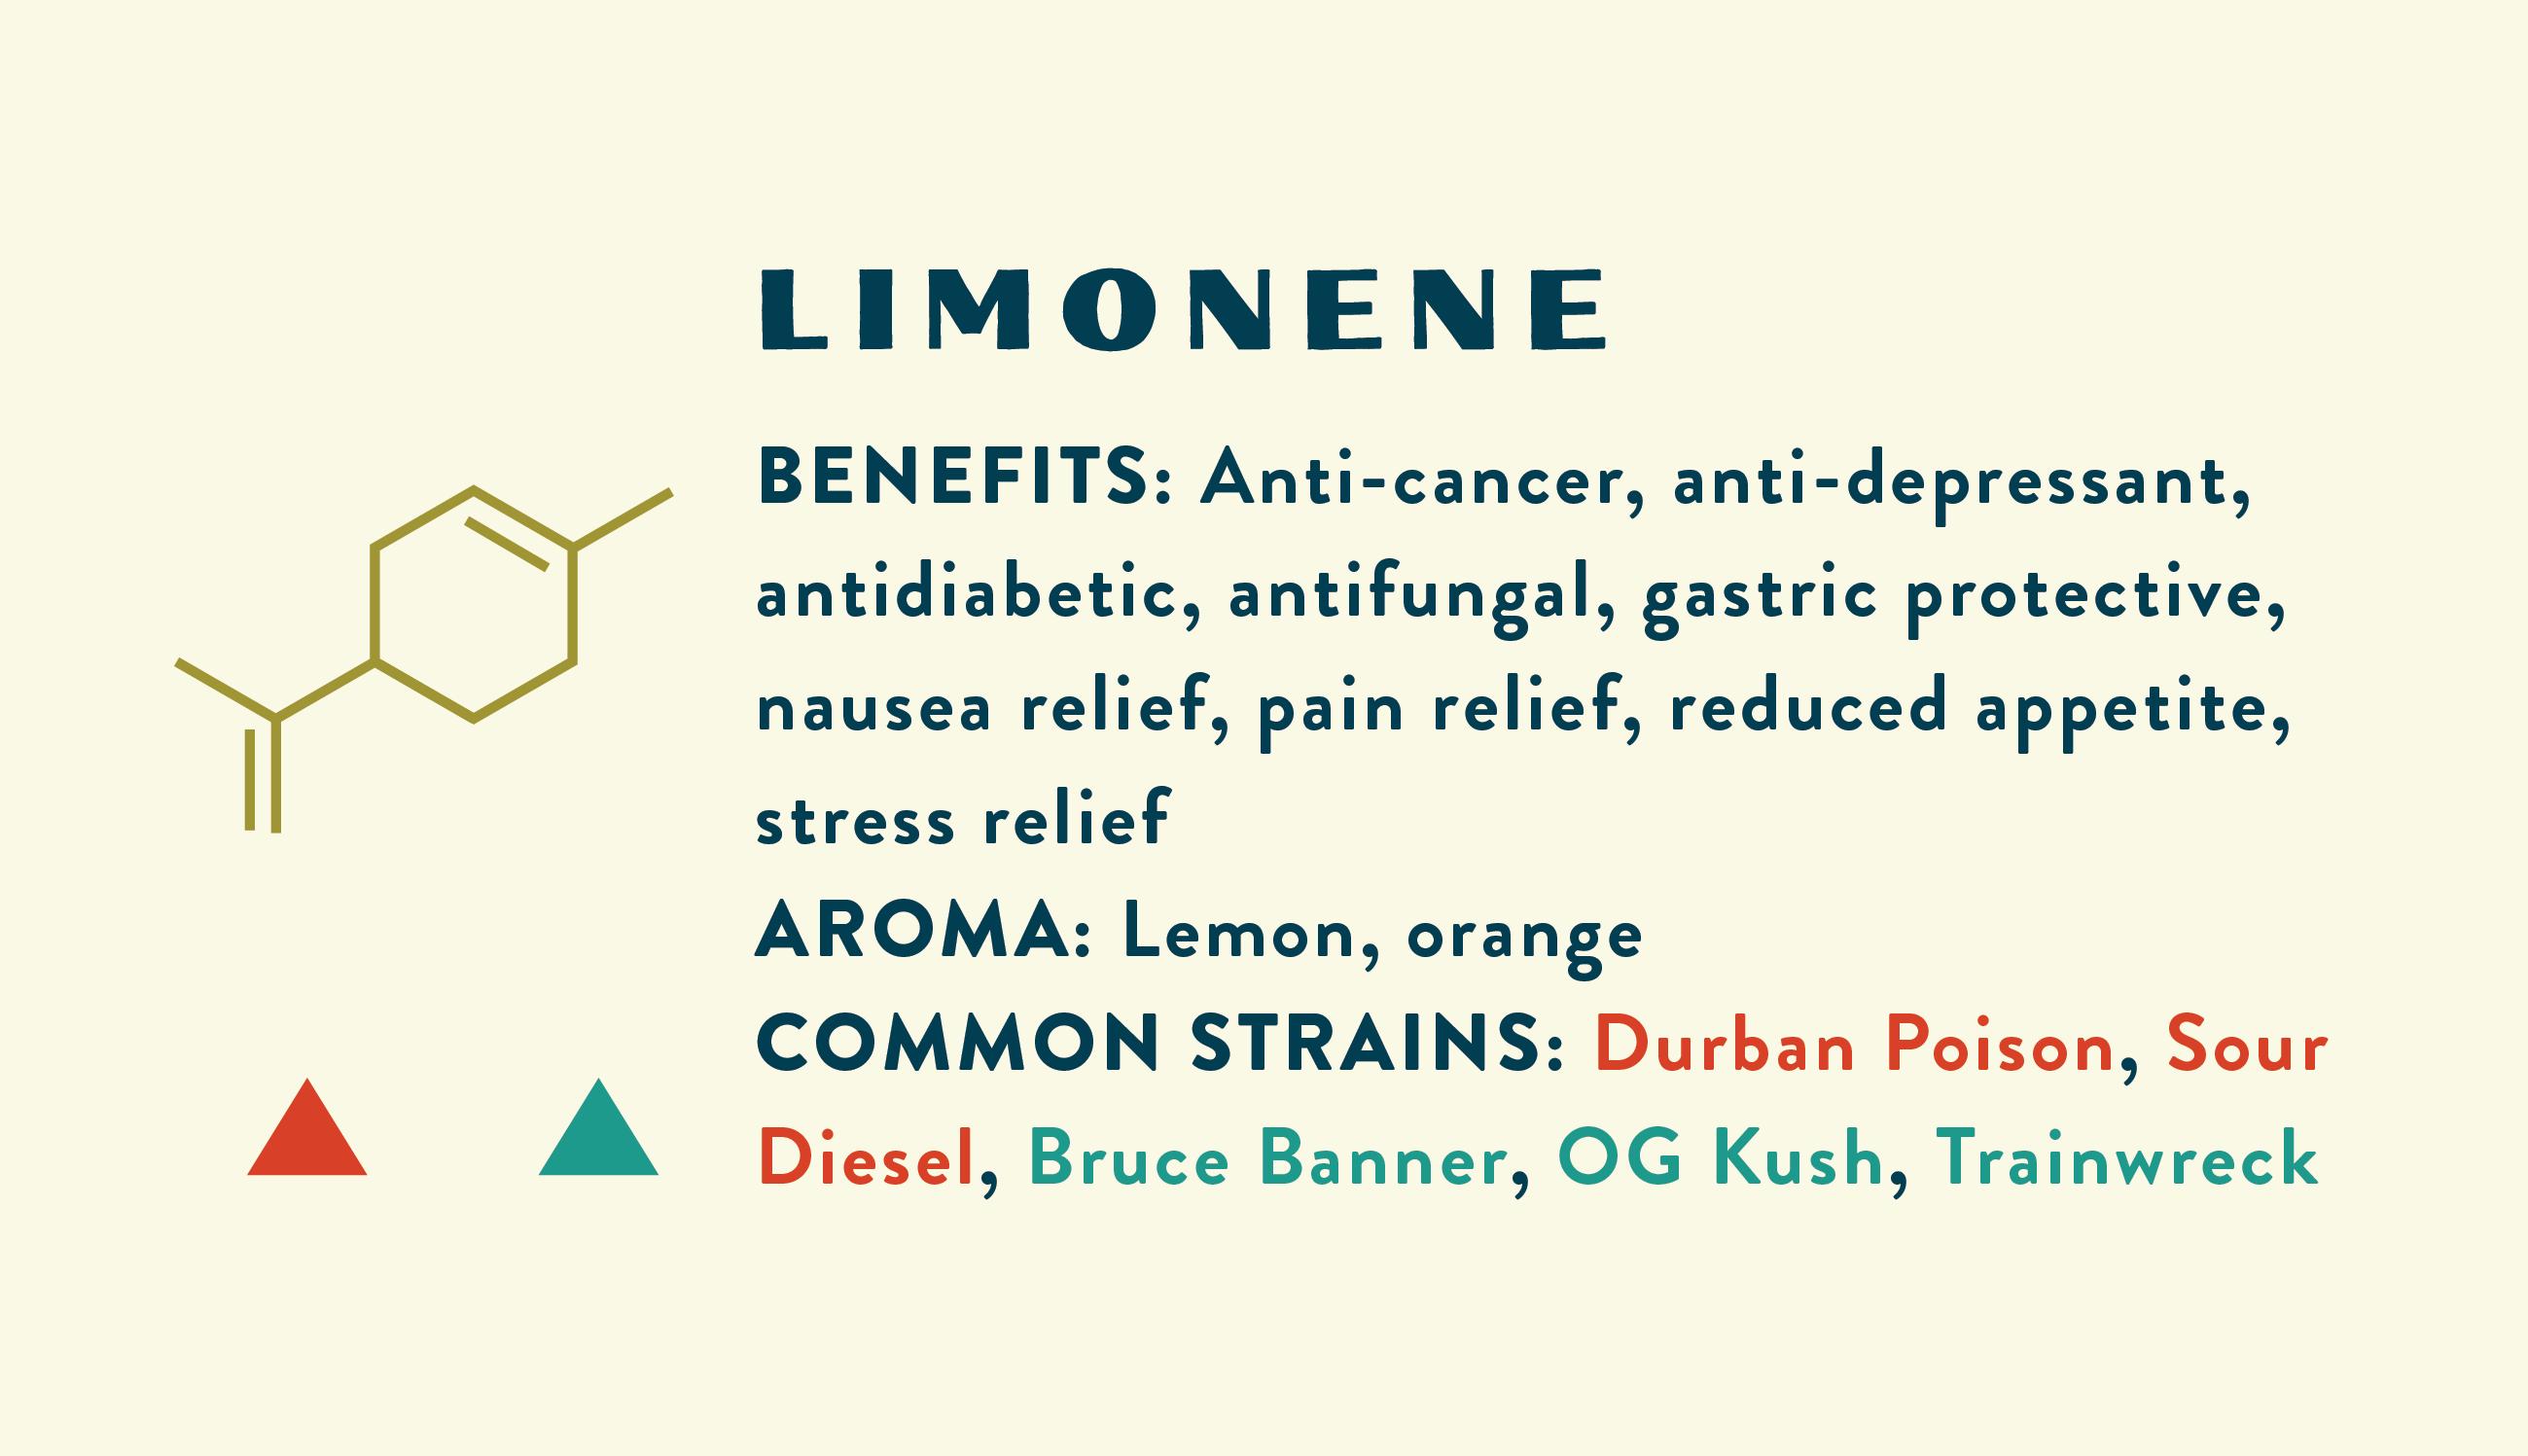 Limonene Information